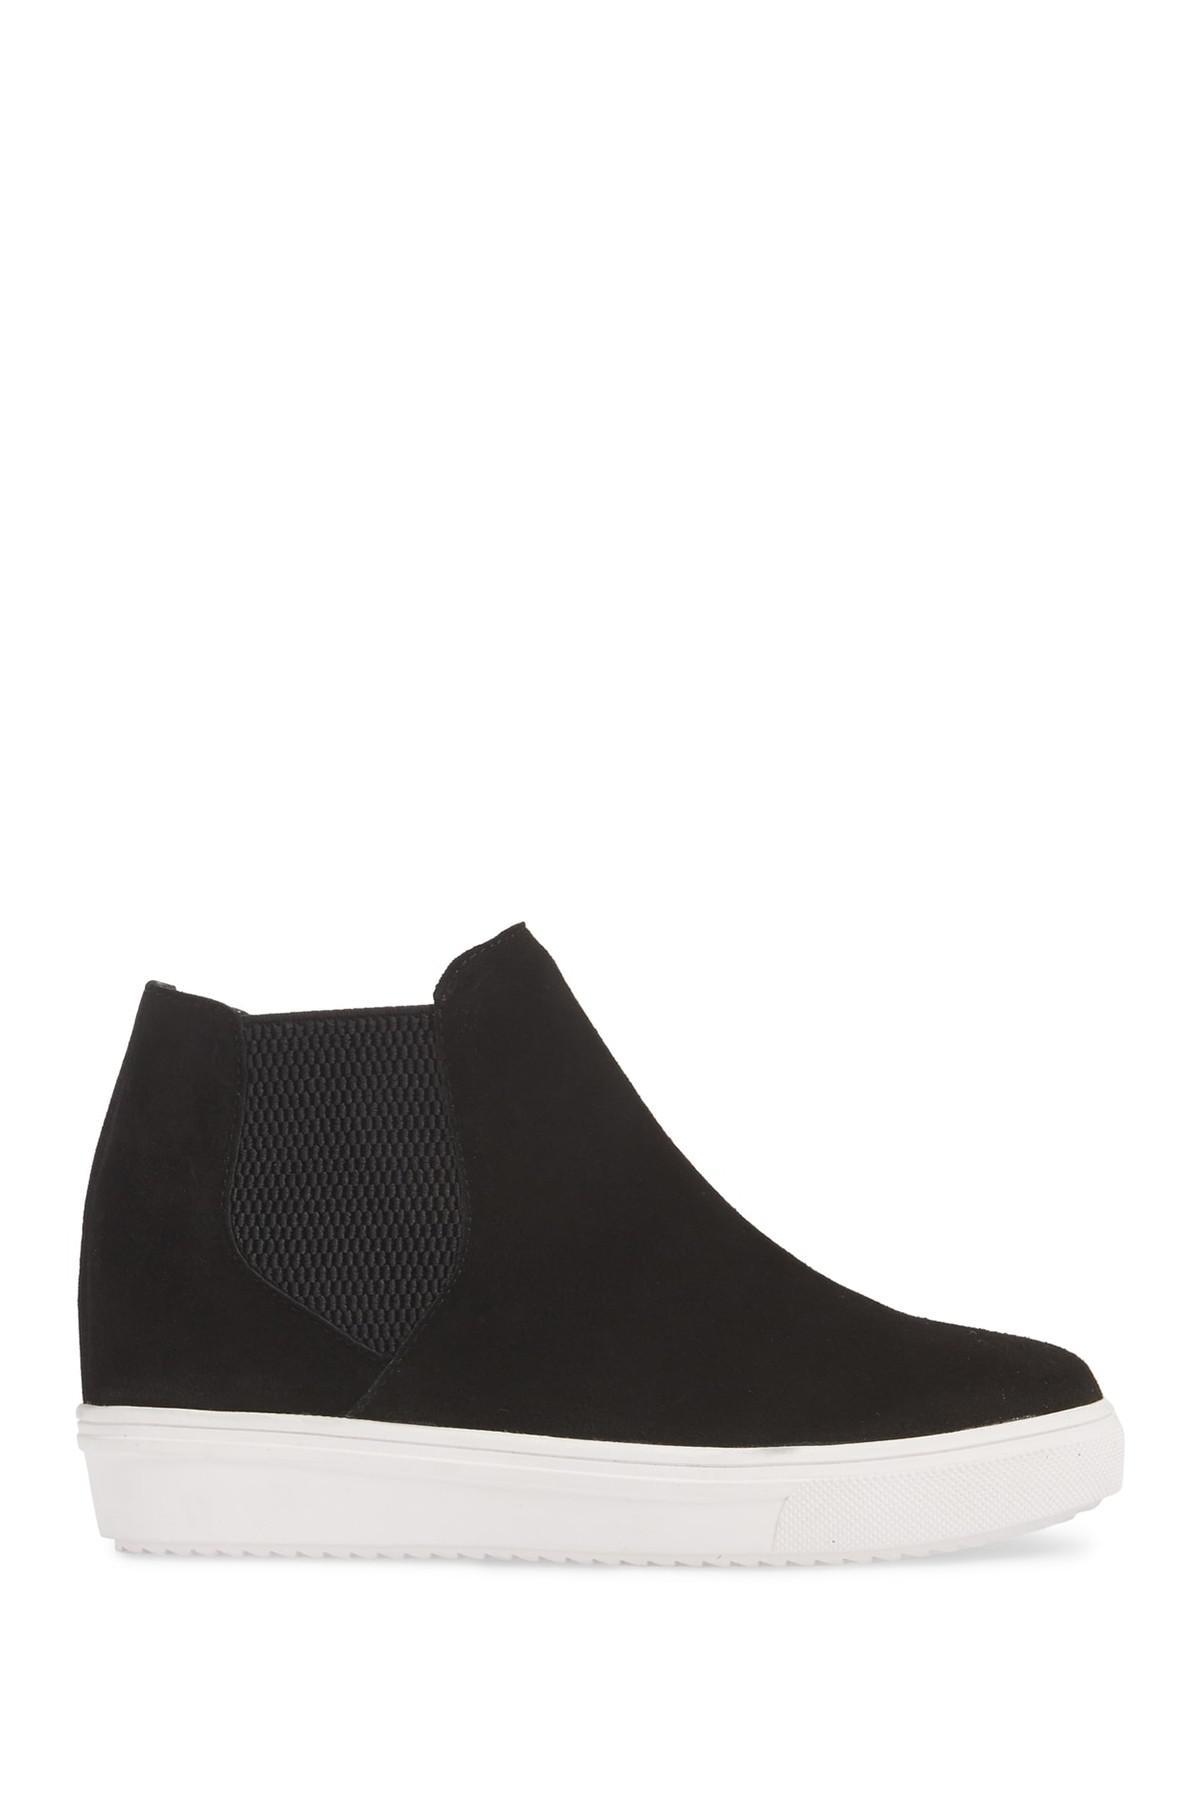 3d3cd138b23 Lyst - Steve Madden Sultan Chelsea Wedge Sneaker (women) in Black